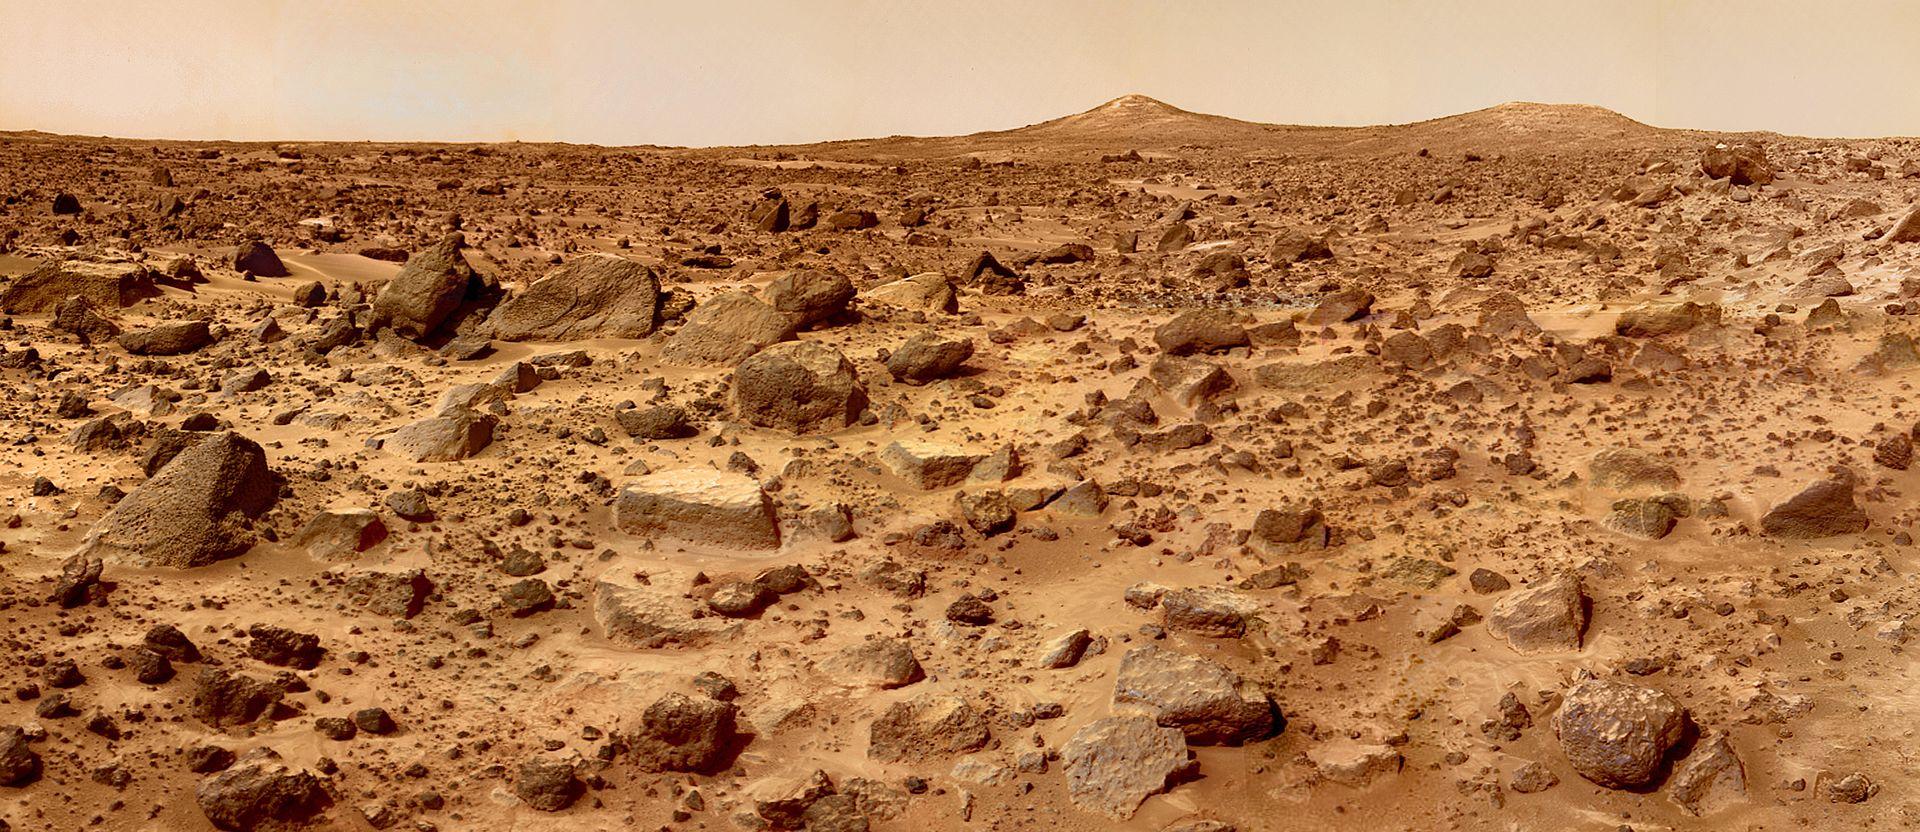 Autor foto NASA/JPL, Mars Pathfinder, sursa Wikipedia.